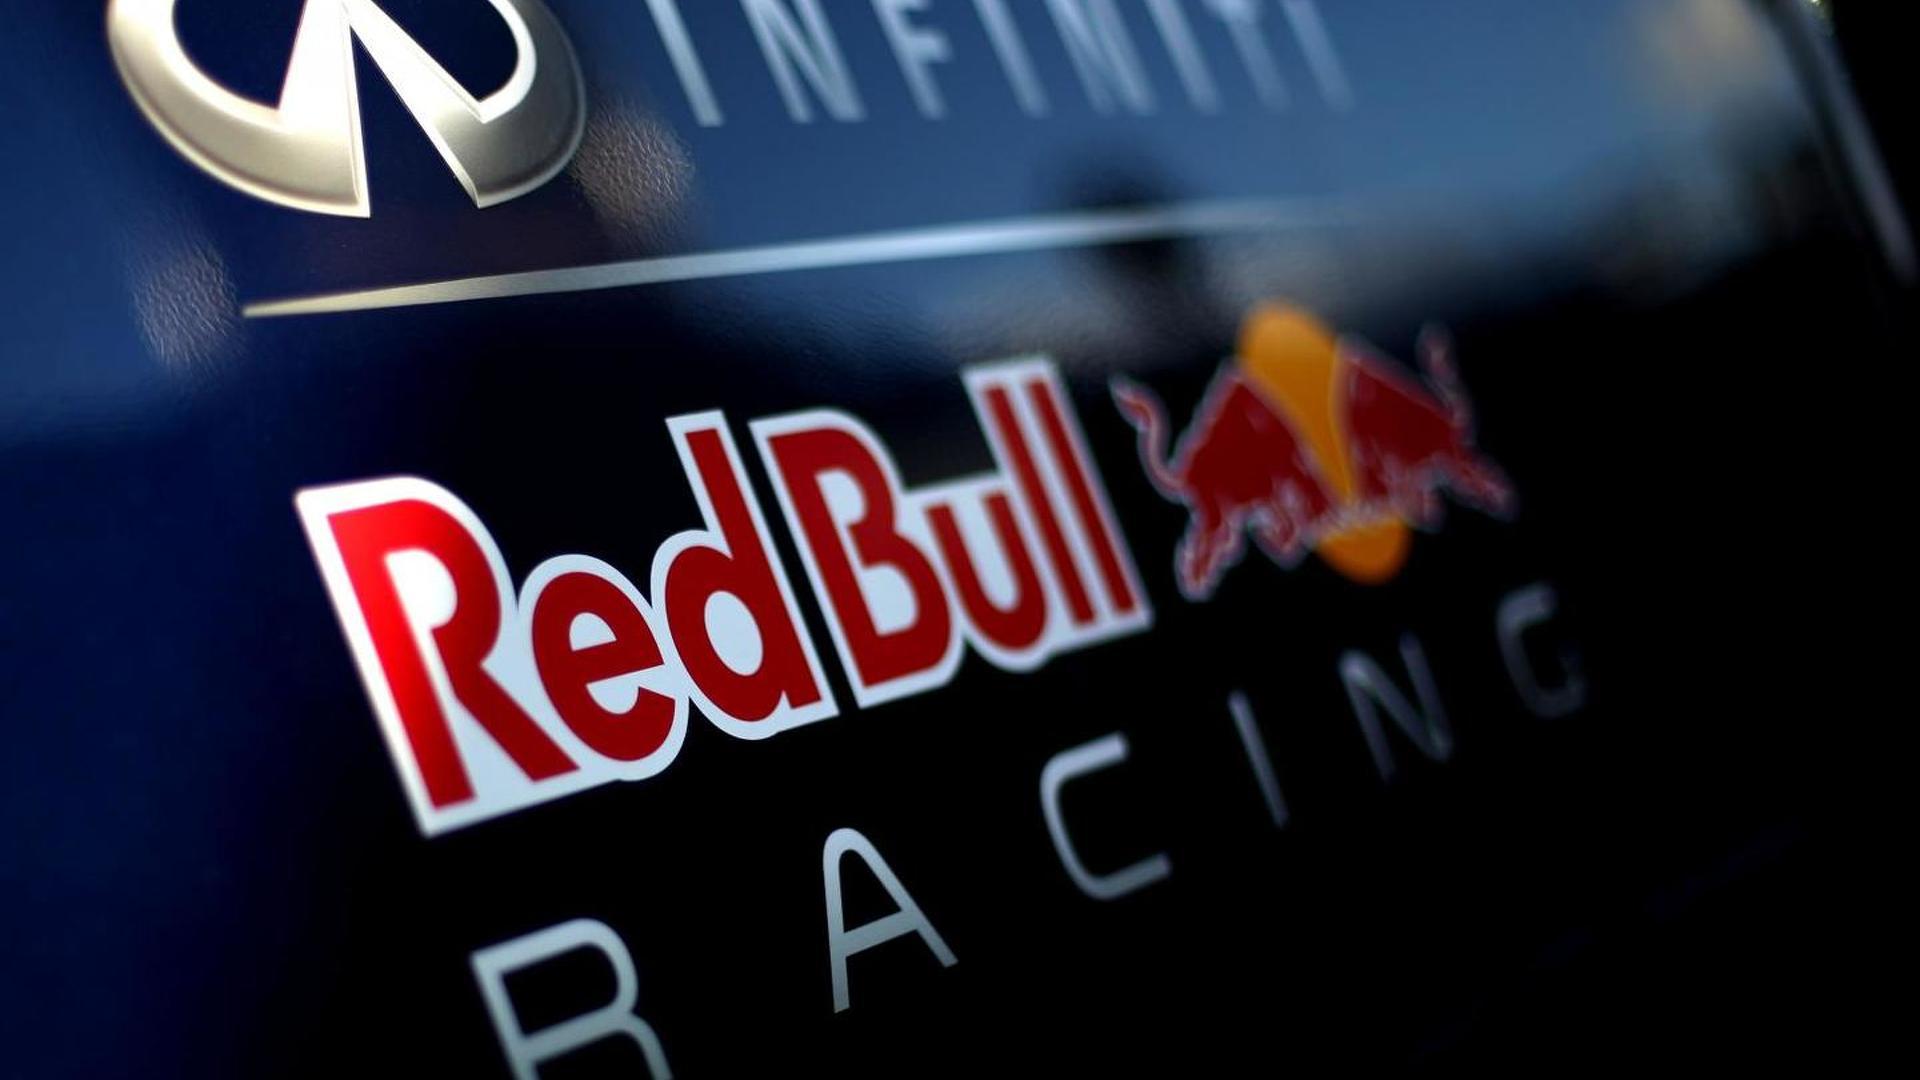 Red Bull considering alternatives to Renault